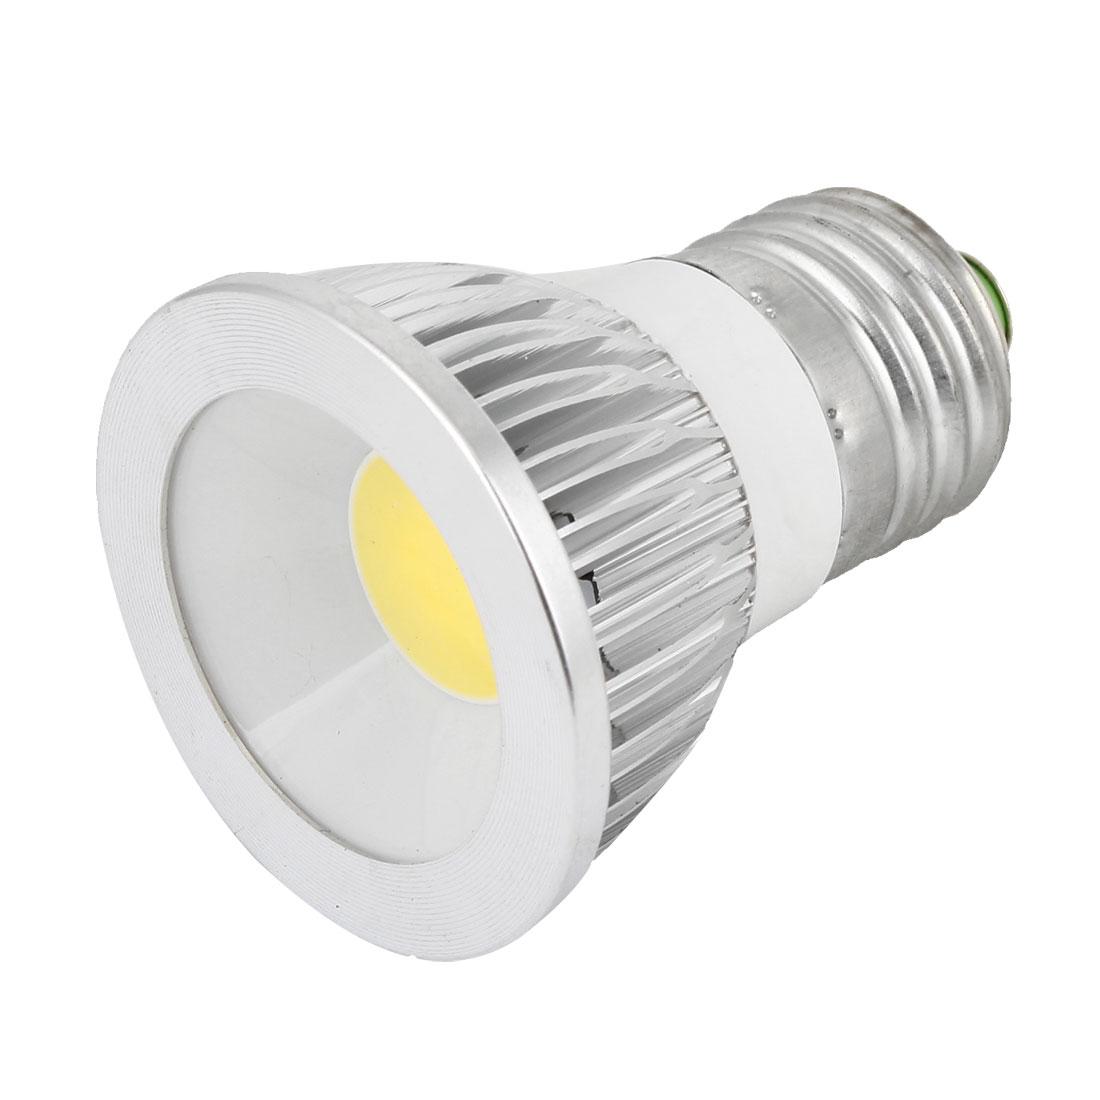 AC 85-265V 6W E27 Dimmable White Light COB LED Downlight Spotlight Bulb